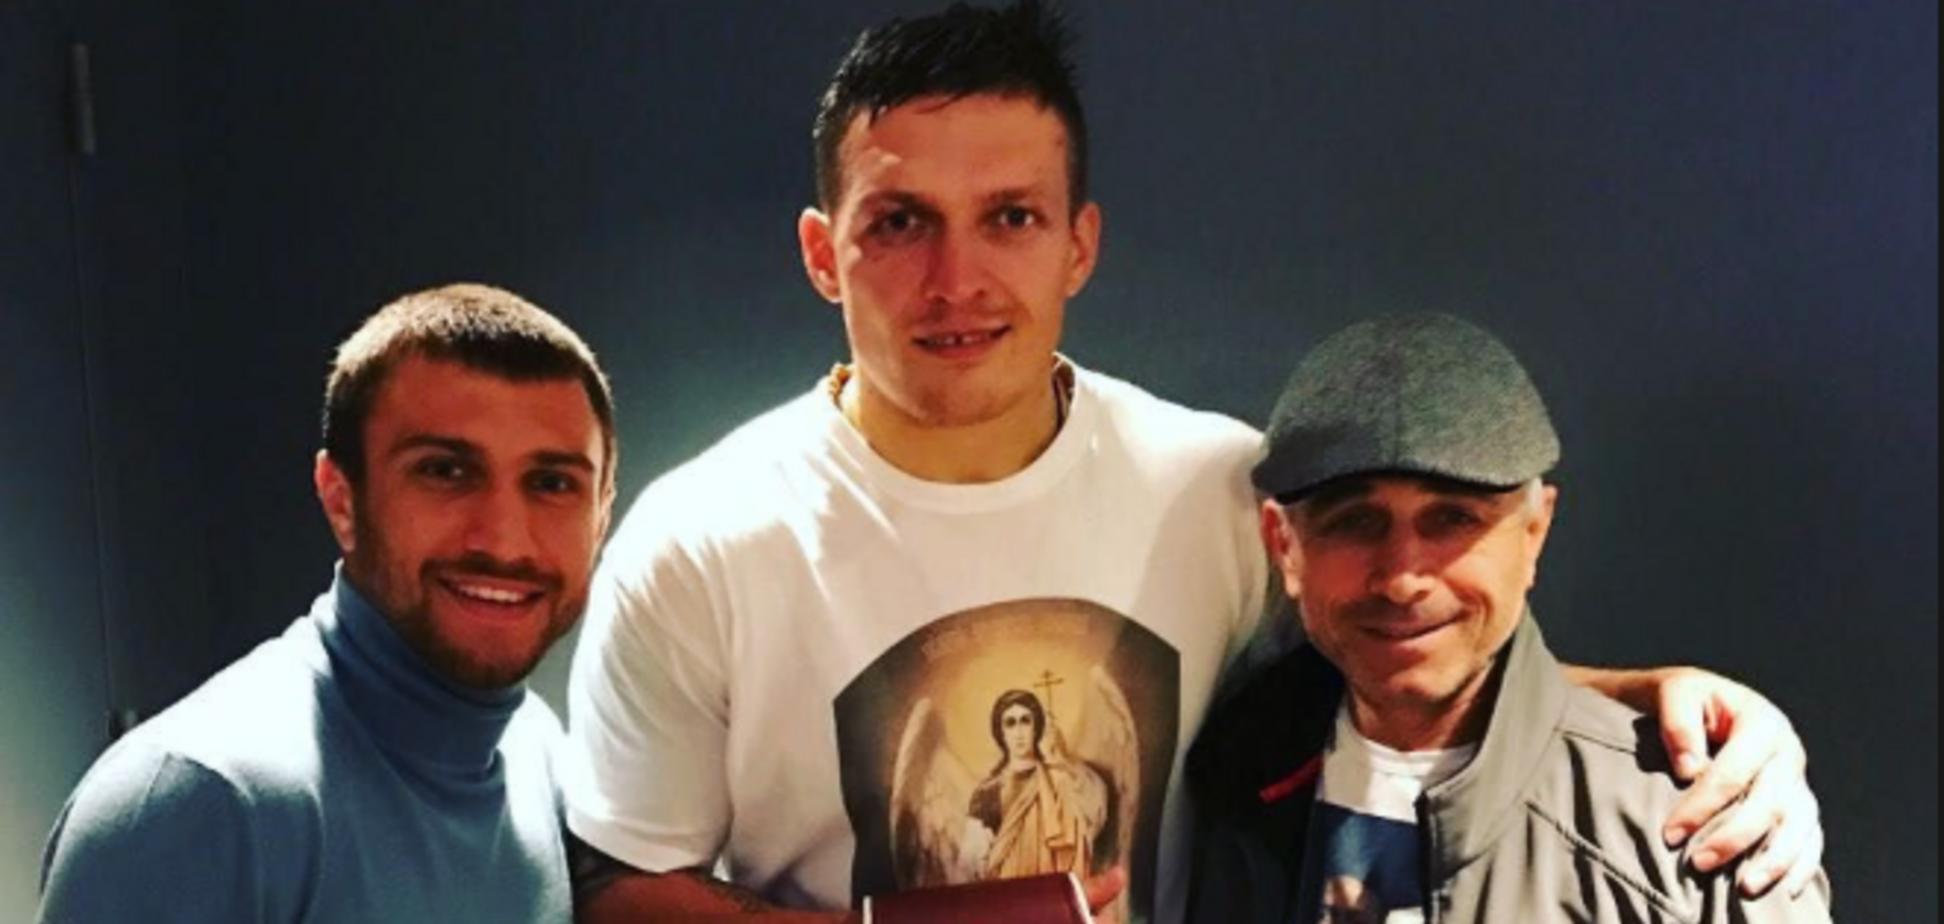 Ломаченко отказался от денег Усика